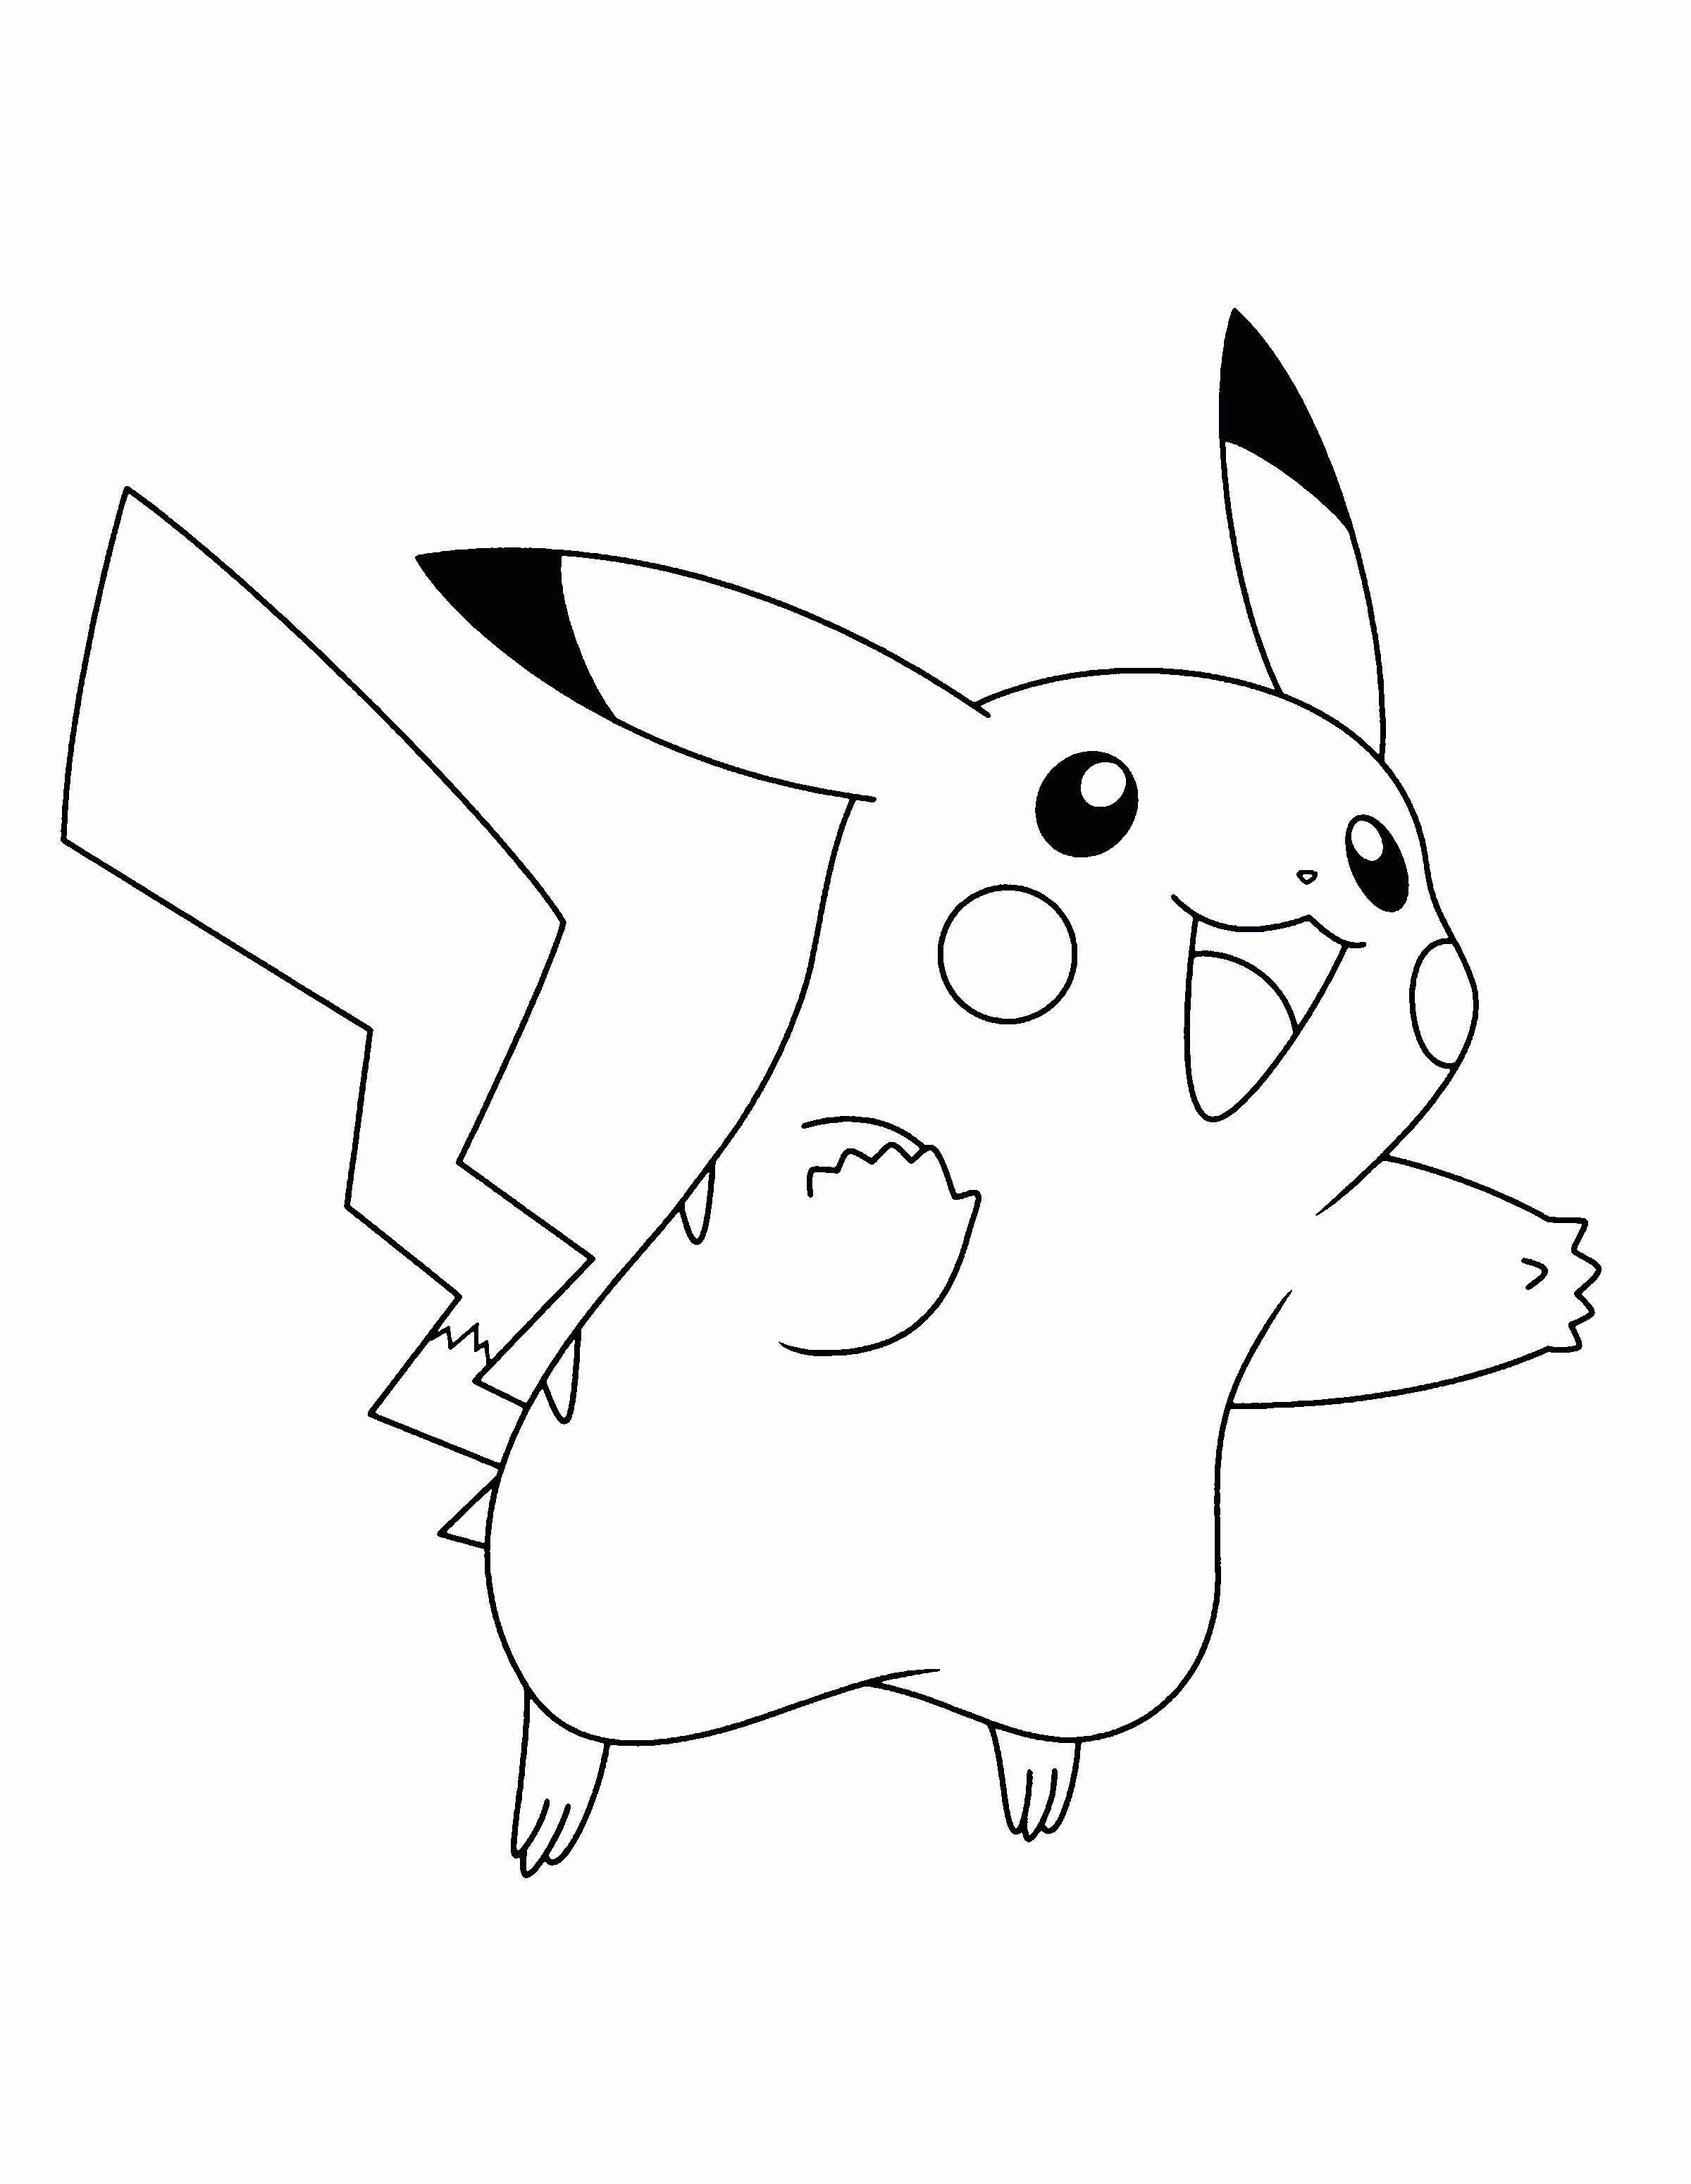 Ausmalbilder Pokemon Plinfa Genial Malvorlagen Malvorlagen Pokemon Stock